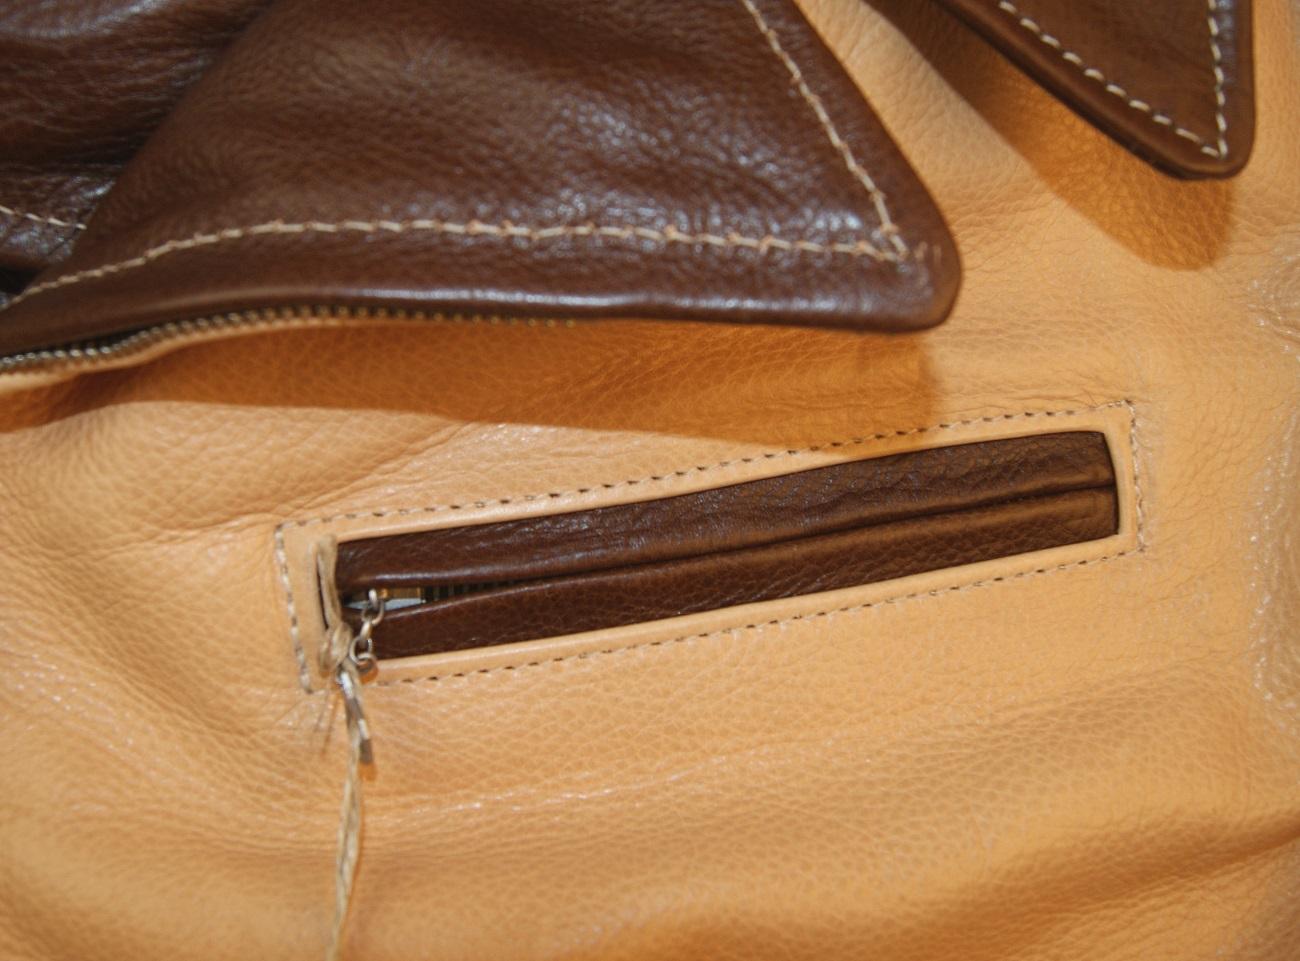 Aero Two-Tone Hooch Hauler Russet Natural Vicenza chest pocket.jpg